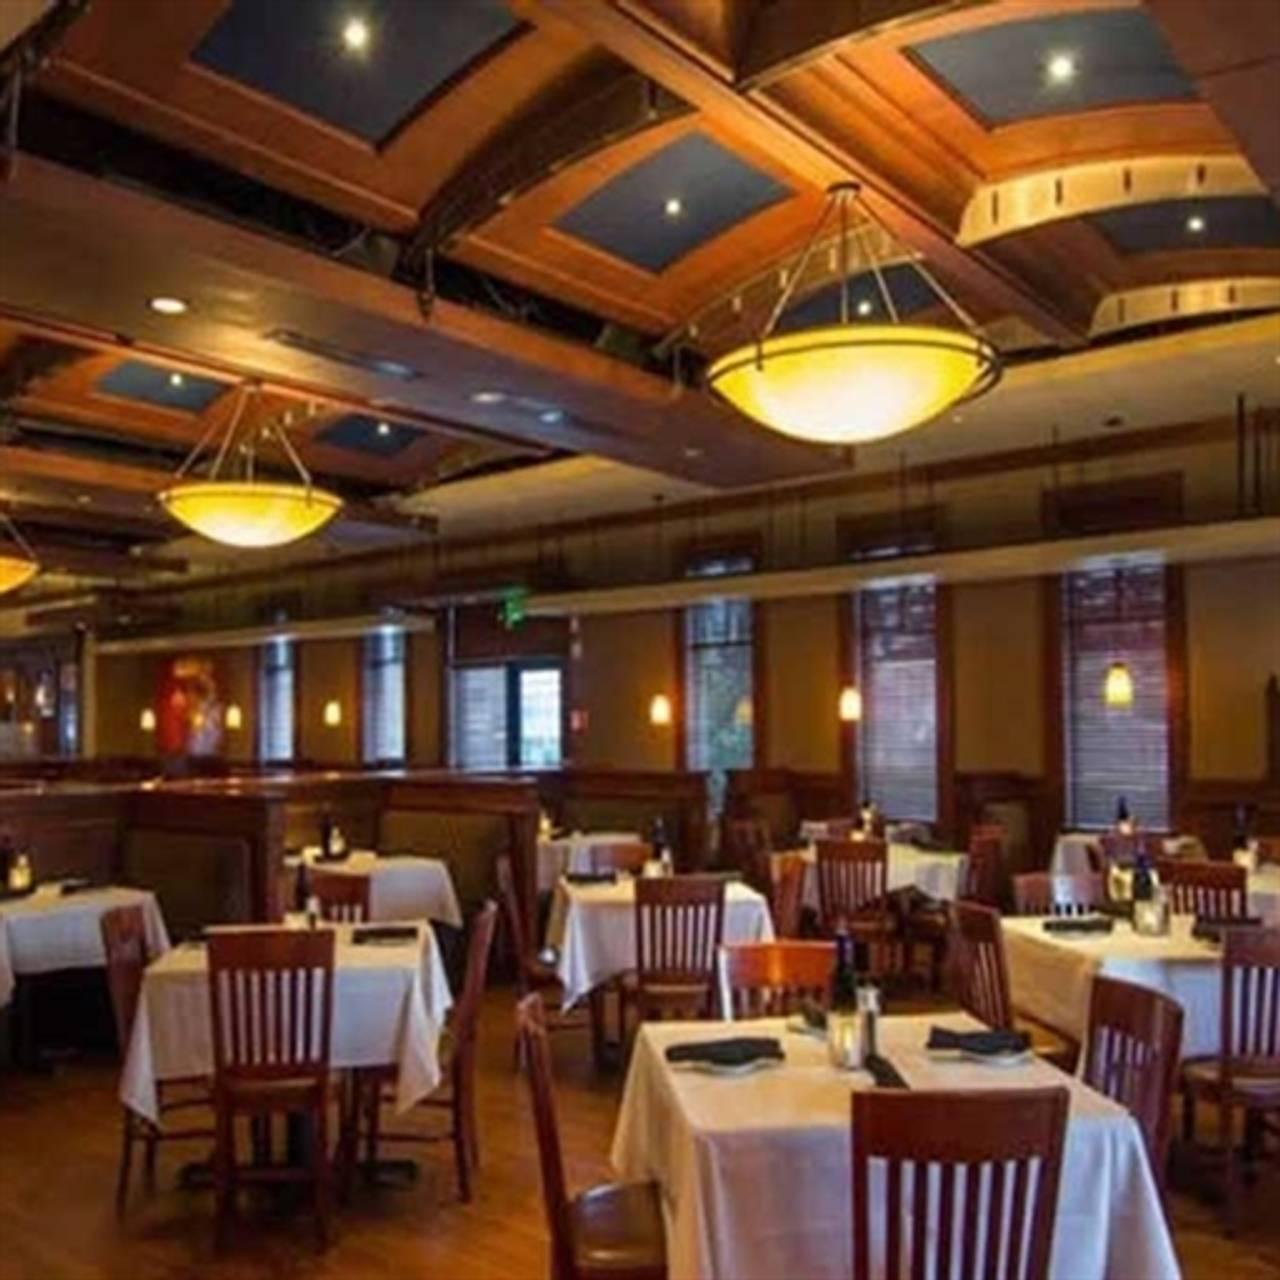 Lugano Ristorante Restaurant Cary Nc Opentable